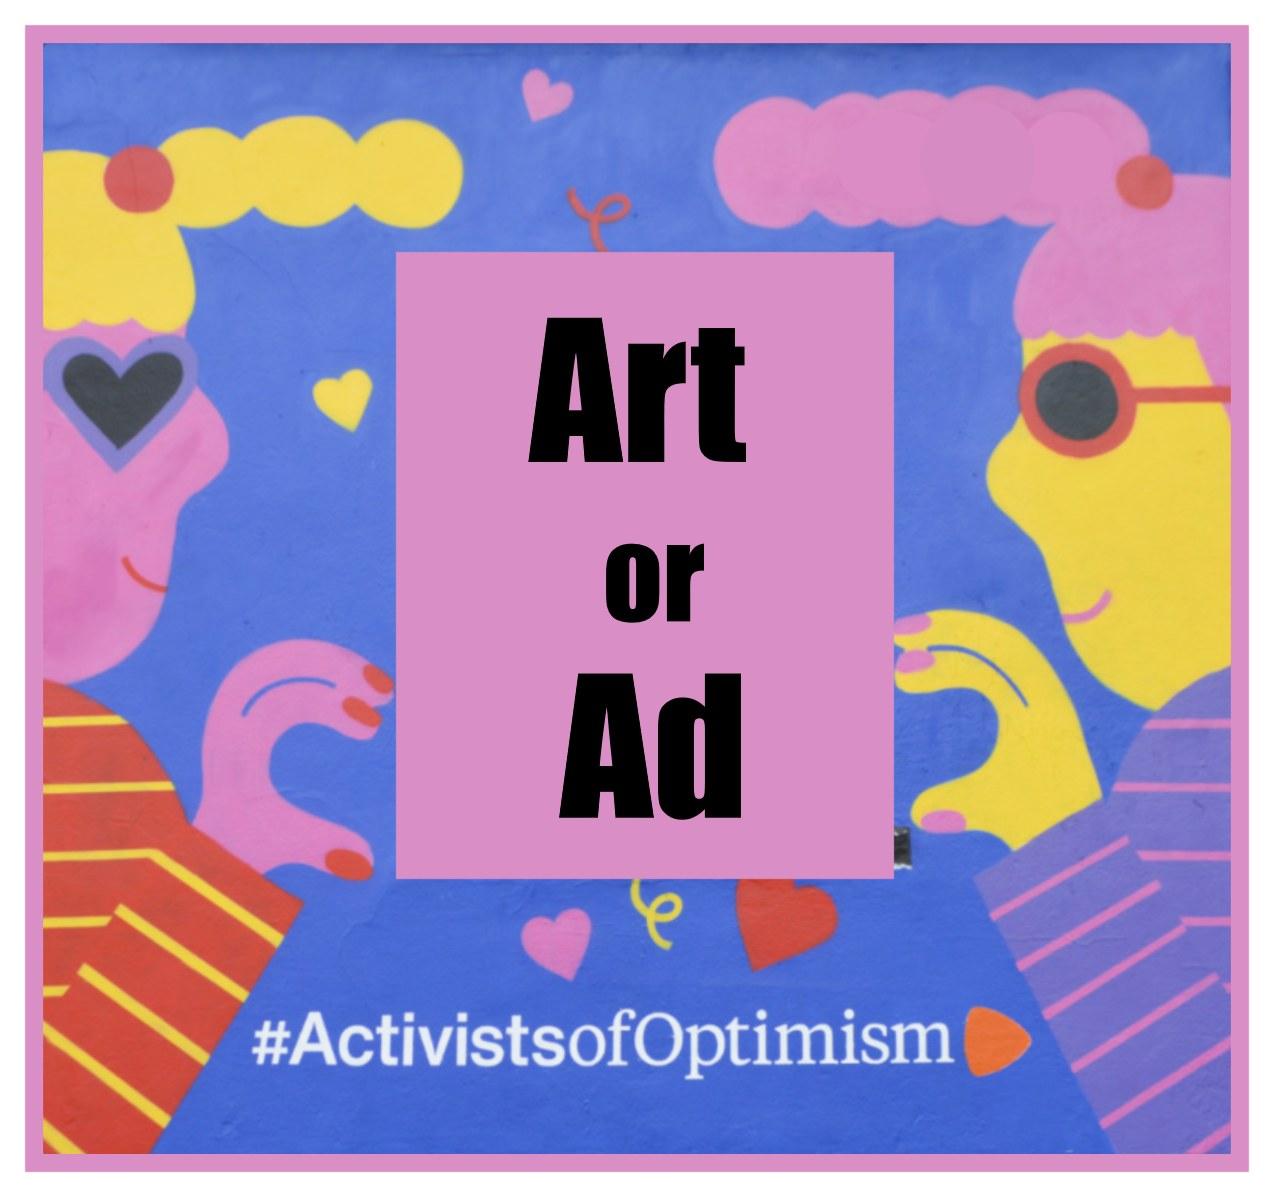 Art or ad? be kitschig blog Berlin